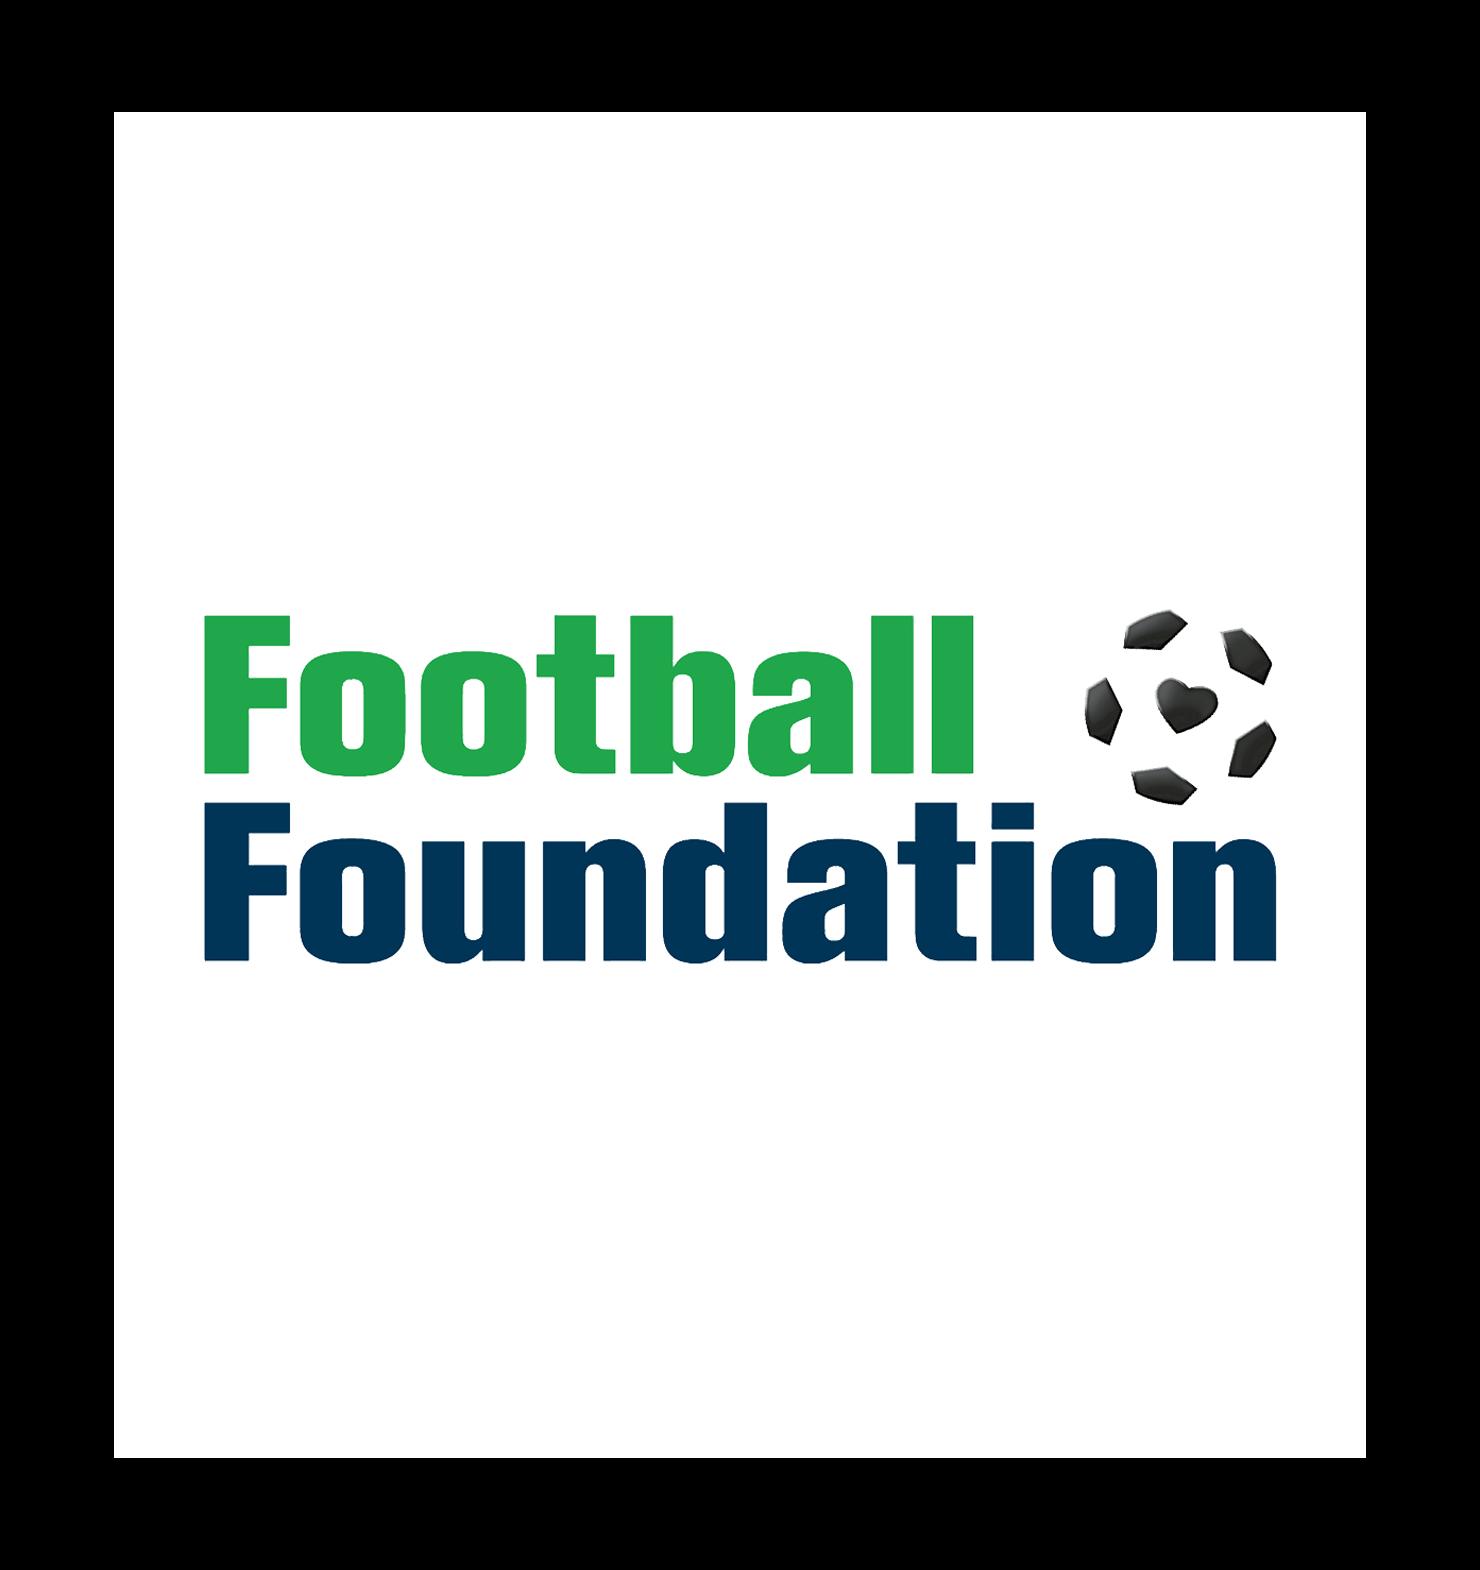 Football Foundation  Financial supporter